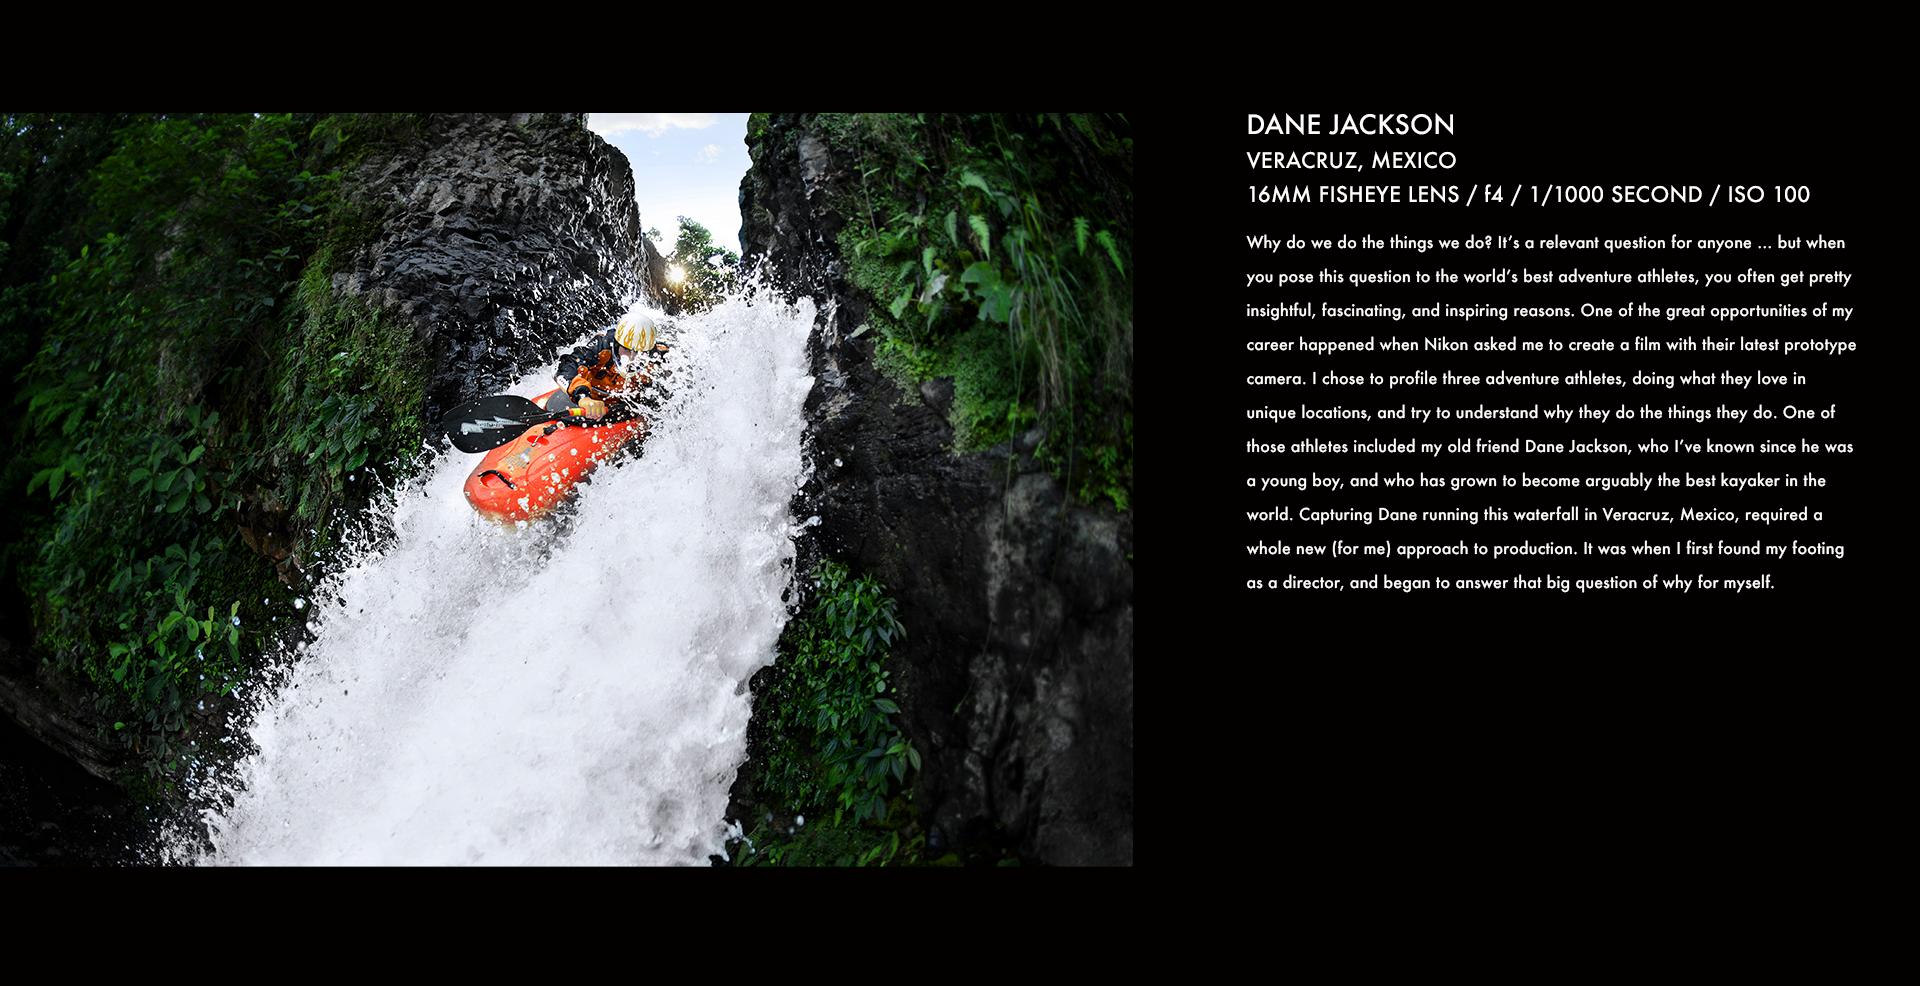 dane jackson, kayaking, whitewater, waterfall, stories behind the images, corey rich